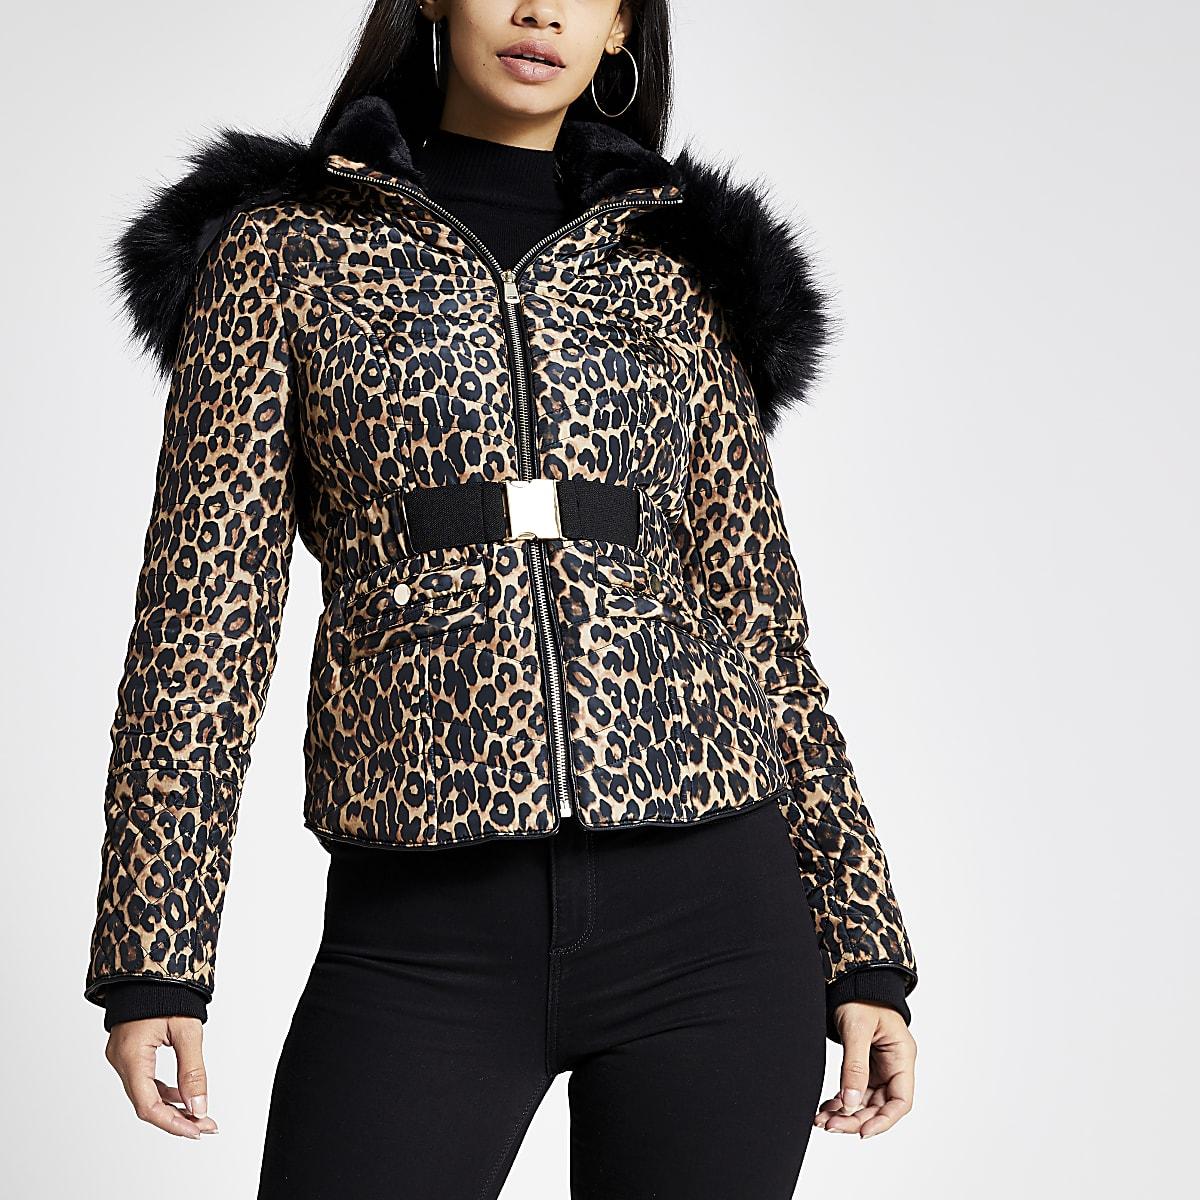 Veste matelassée ajustée marron imprimé léopard